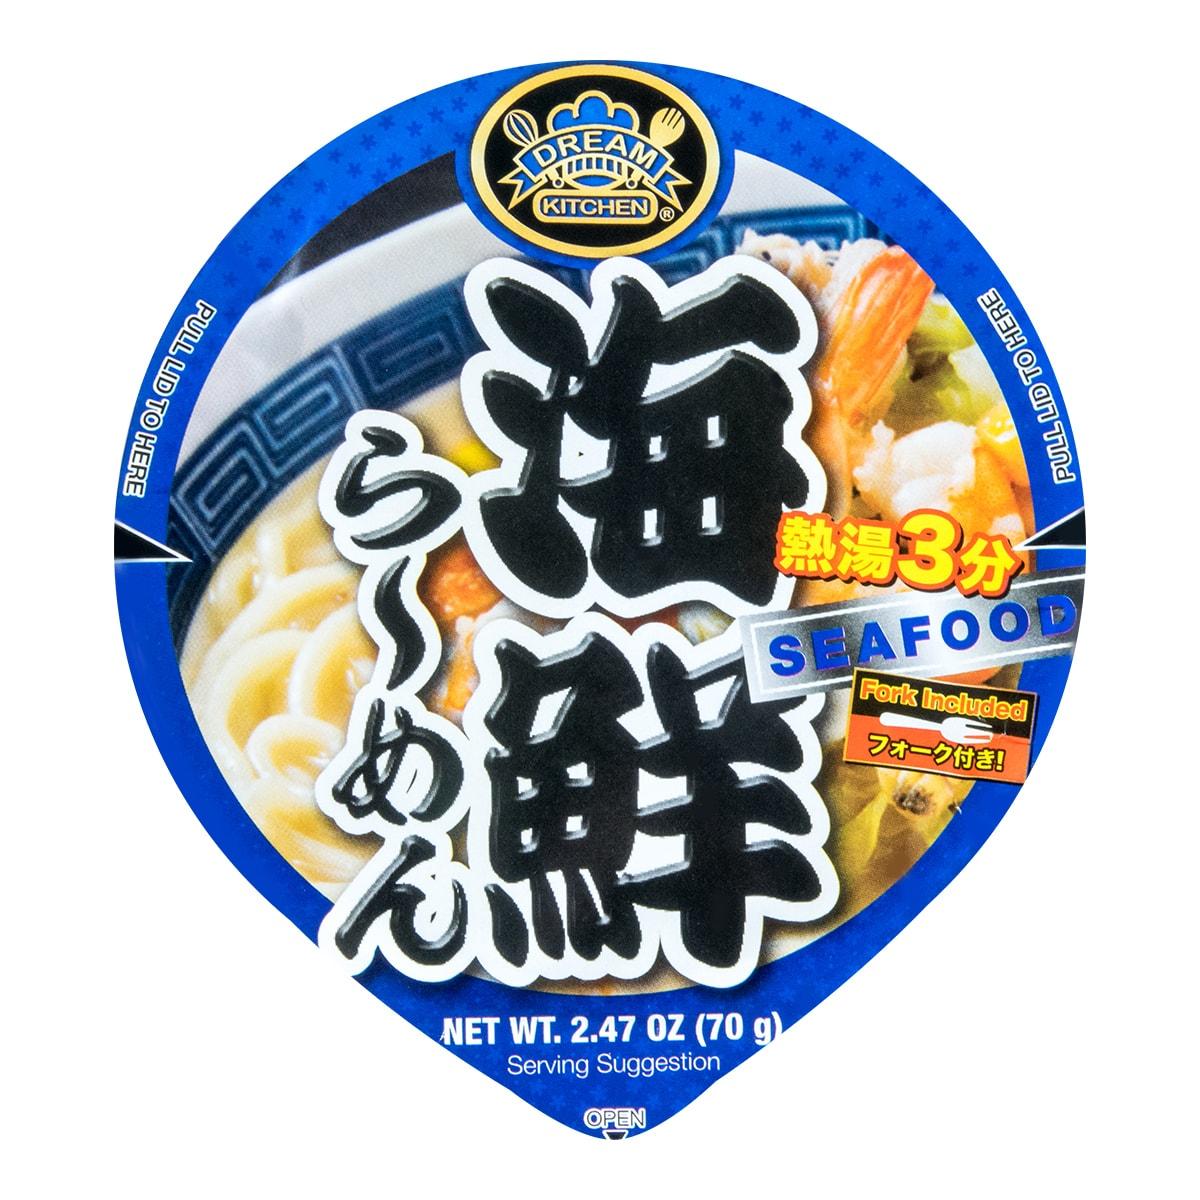 DREAM KITCHEN Seafood Cup Noodles 70g